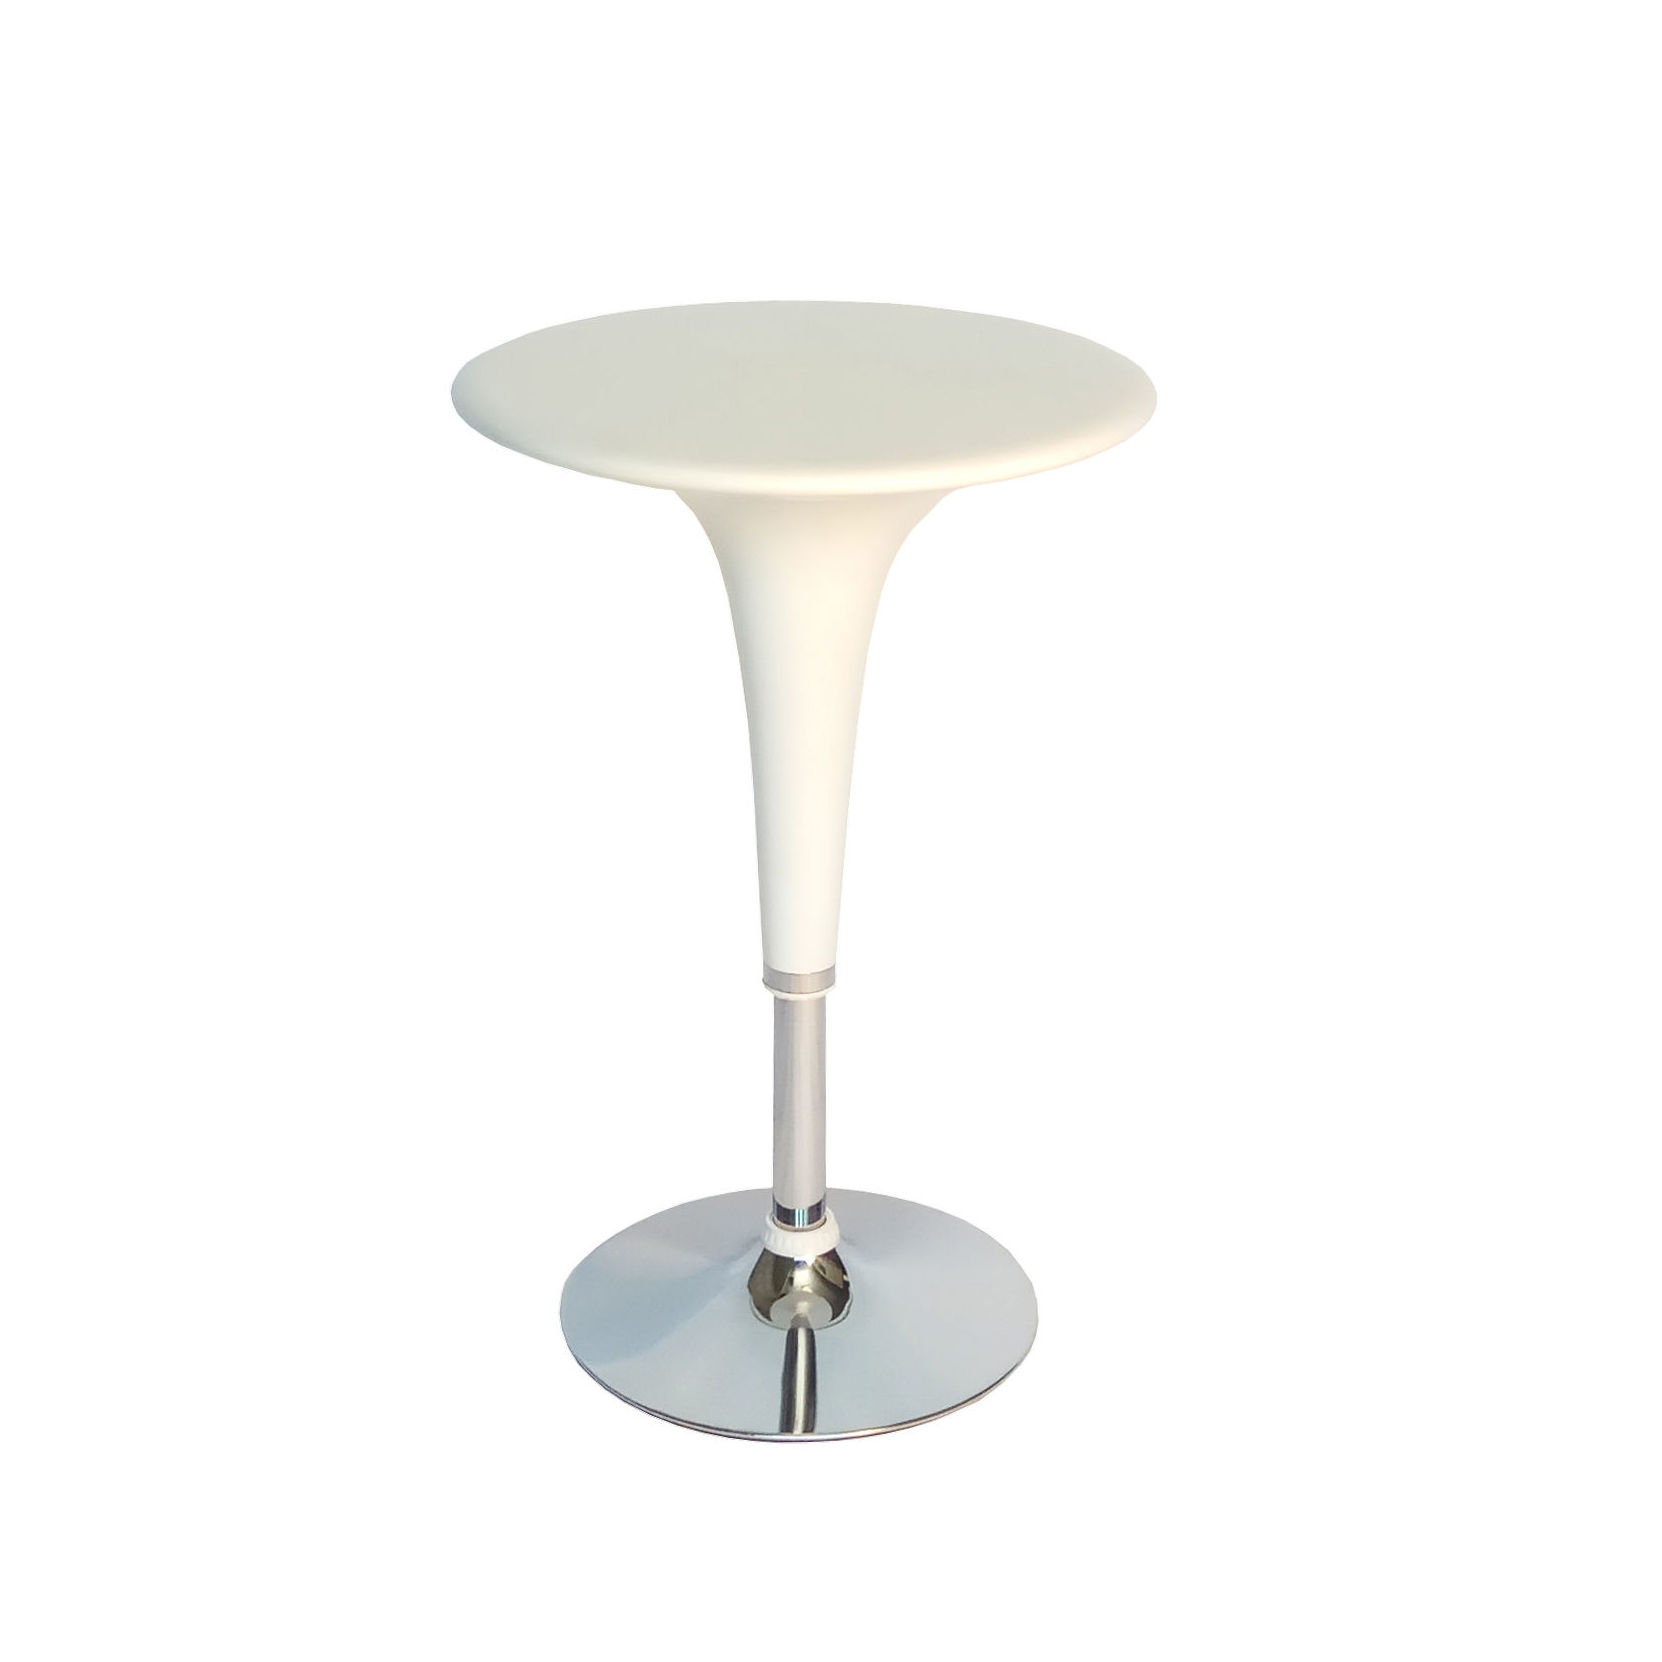 Cool: Alquiler de mobiliario de Stuhl Ibérica Alquiler de Mobiliario